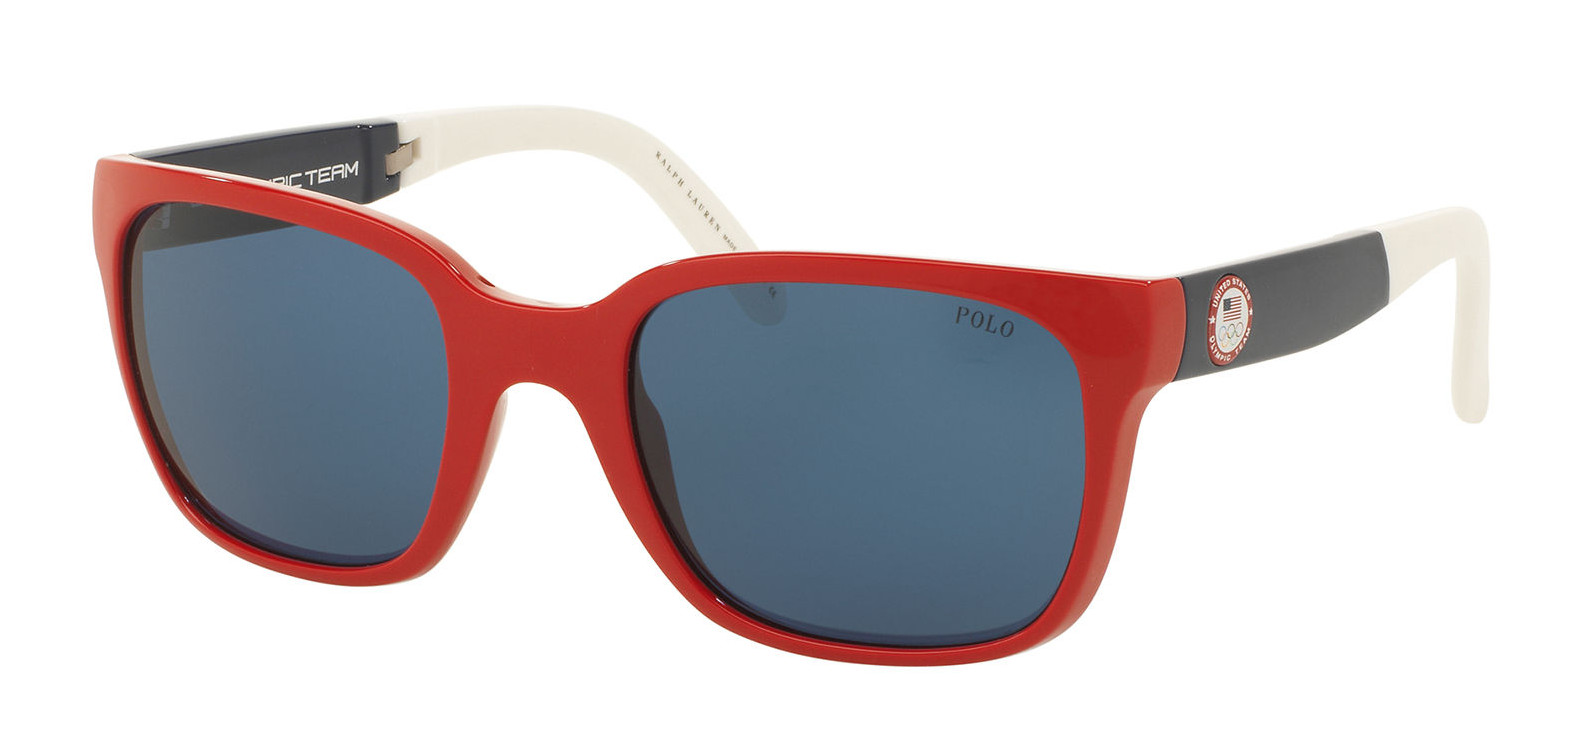 71d0a5b60 Oculos Oakley Ciclismo Mercado Livre « One More Soul